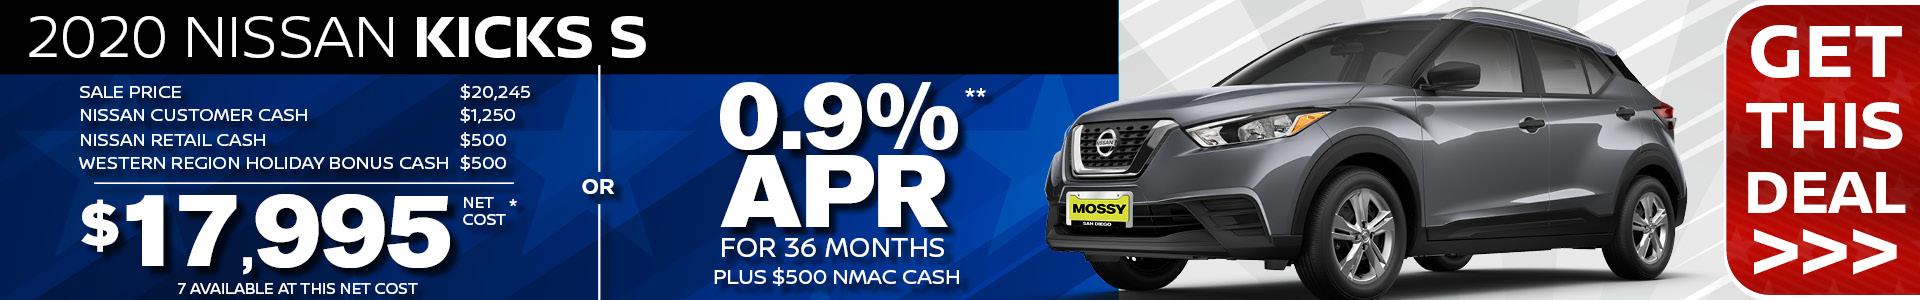 Mossy Nissan - Kicks SRP